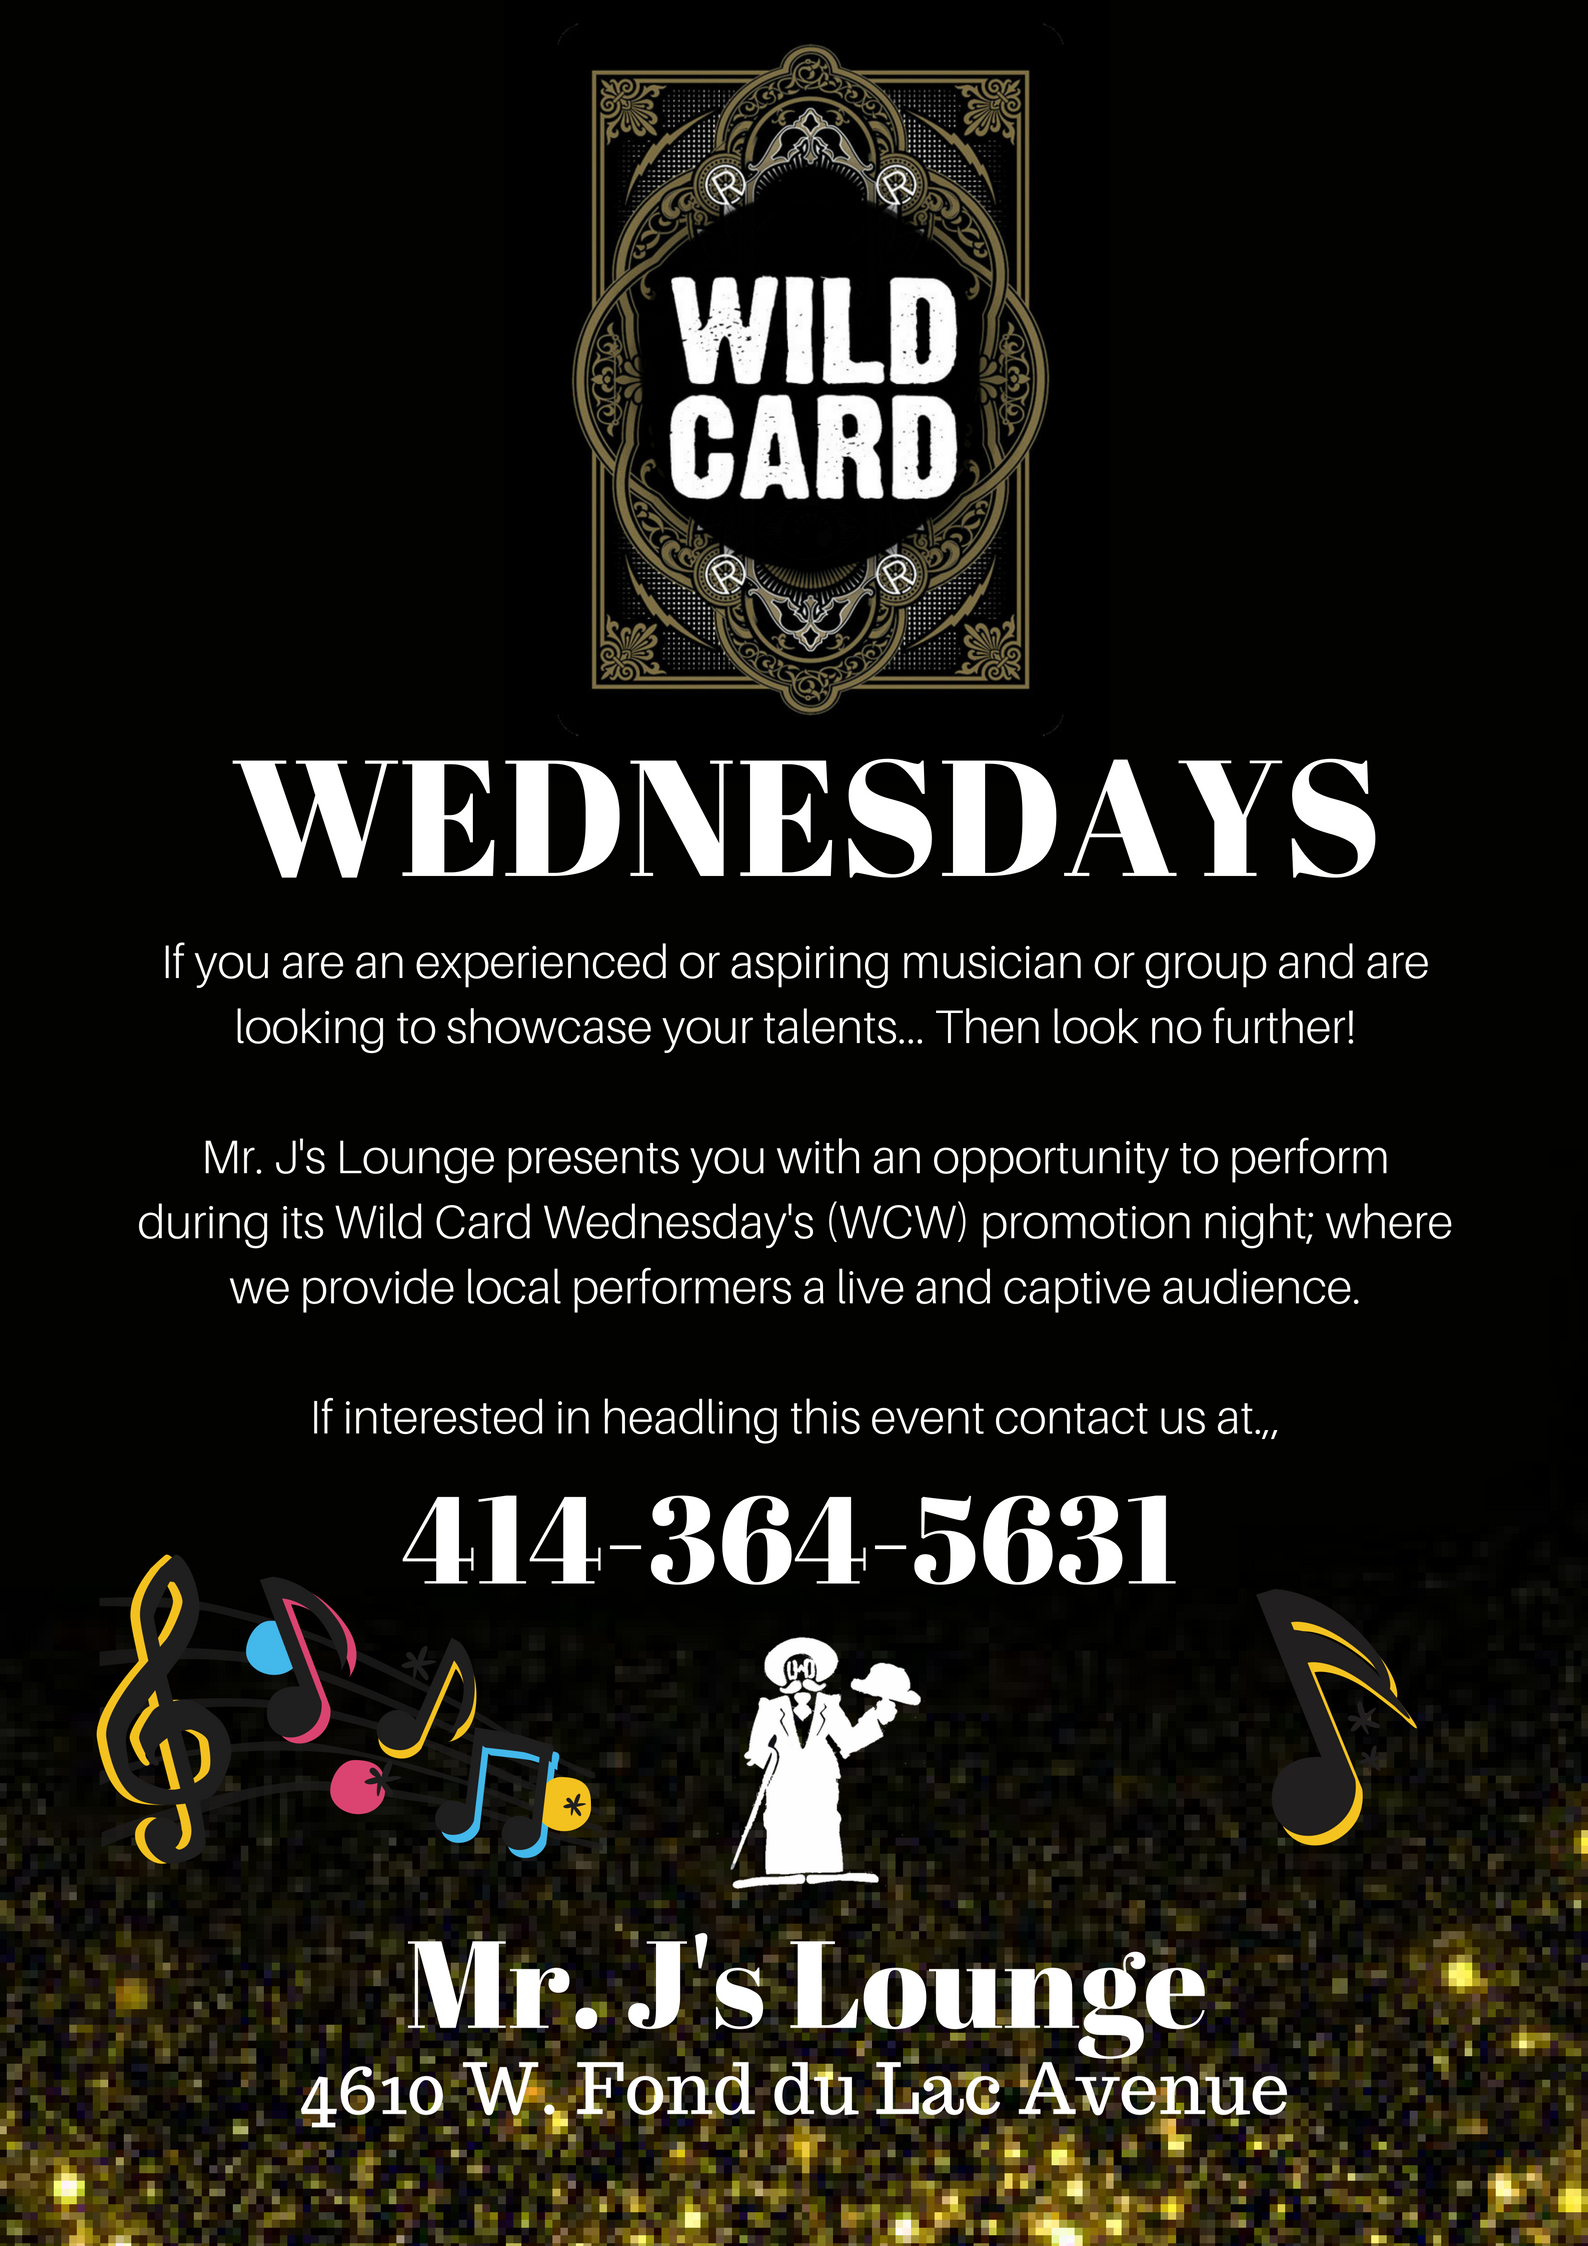 Wild Card Wednesdays